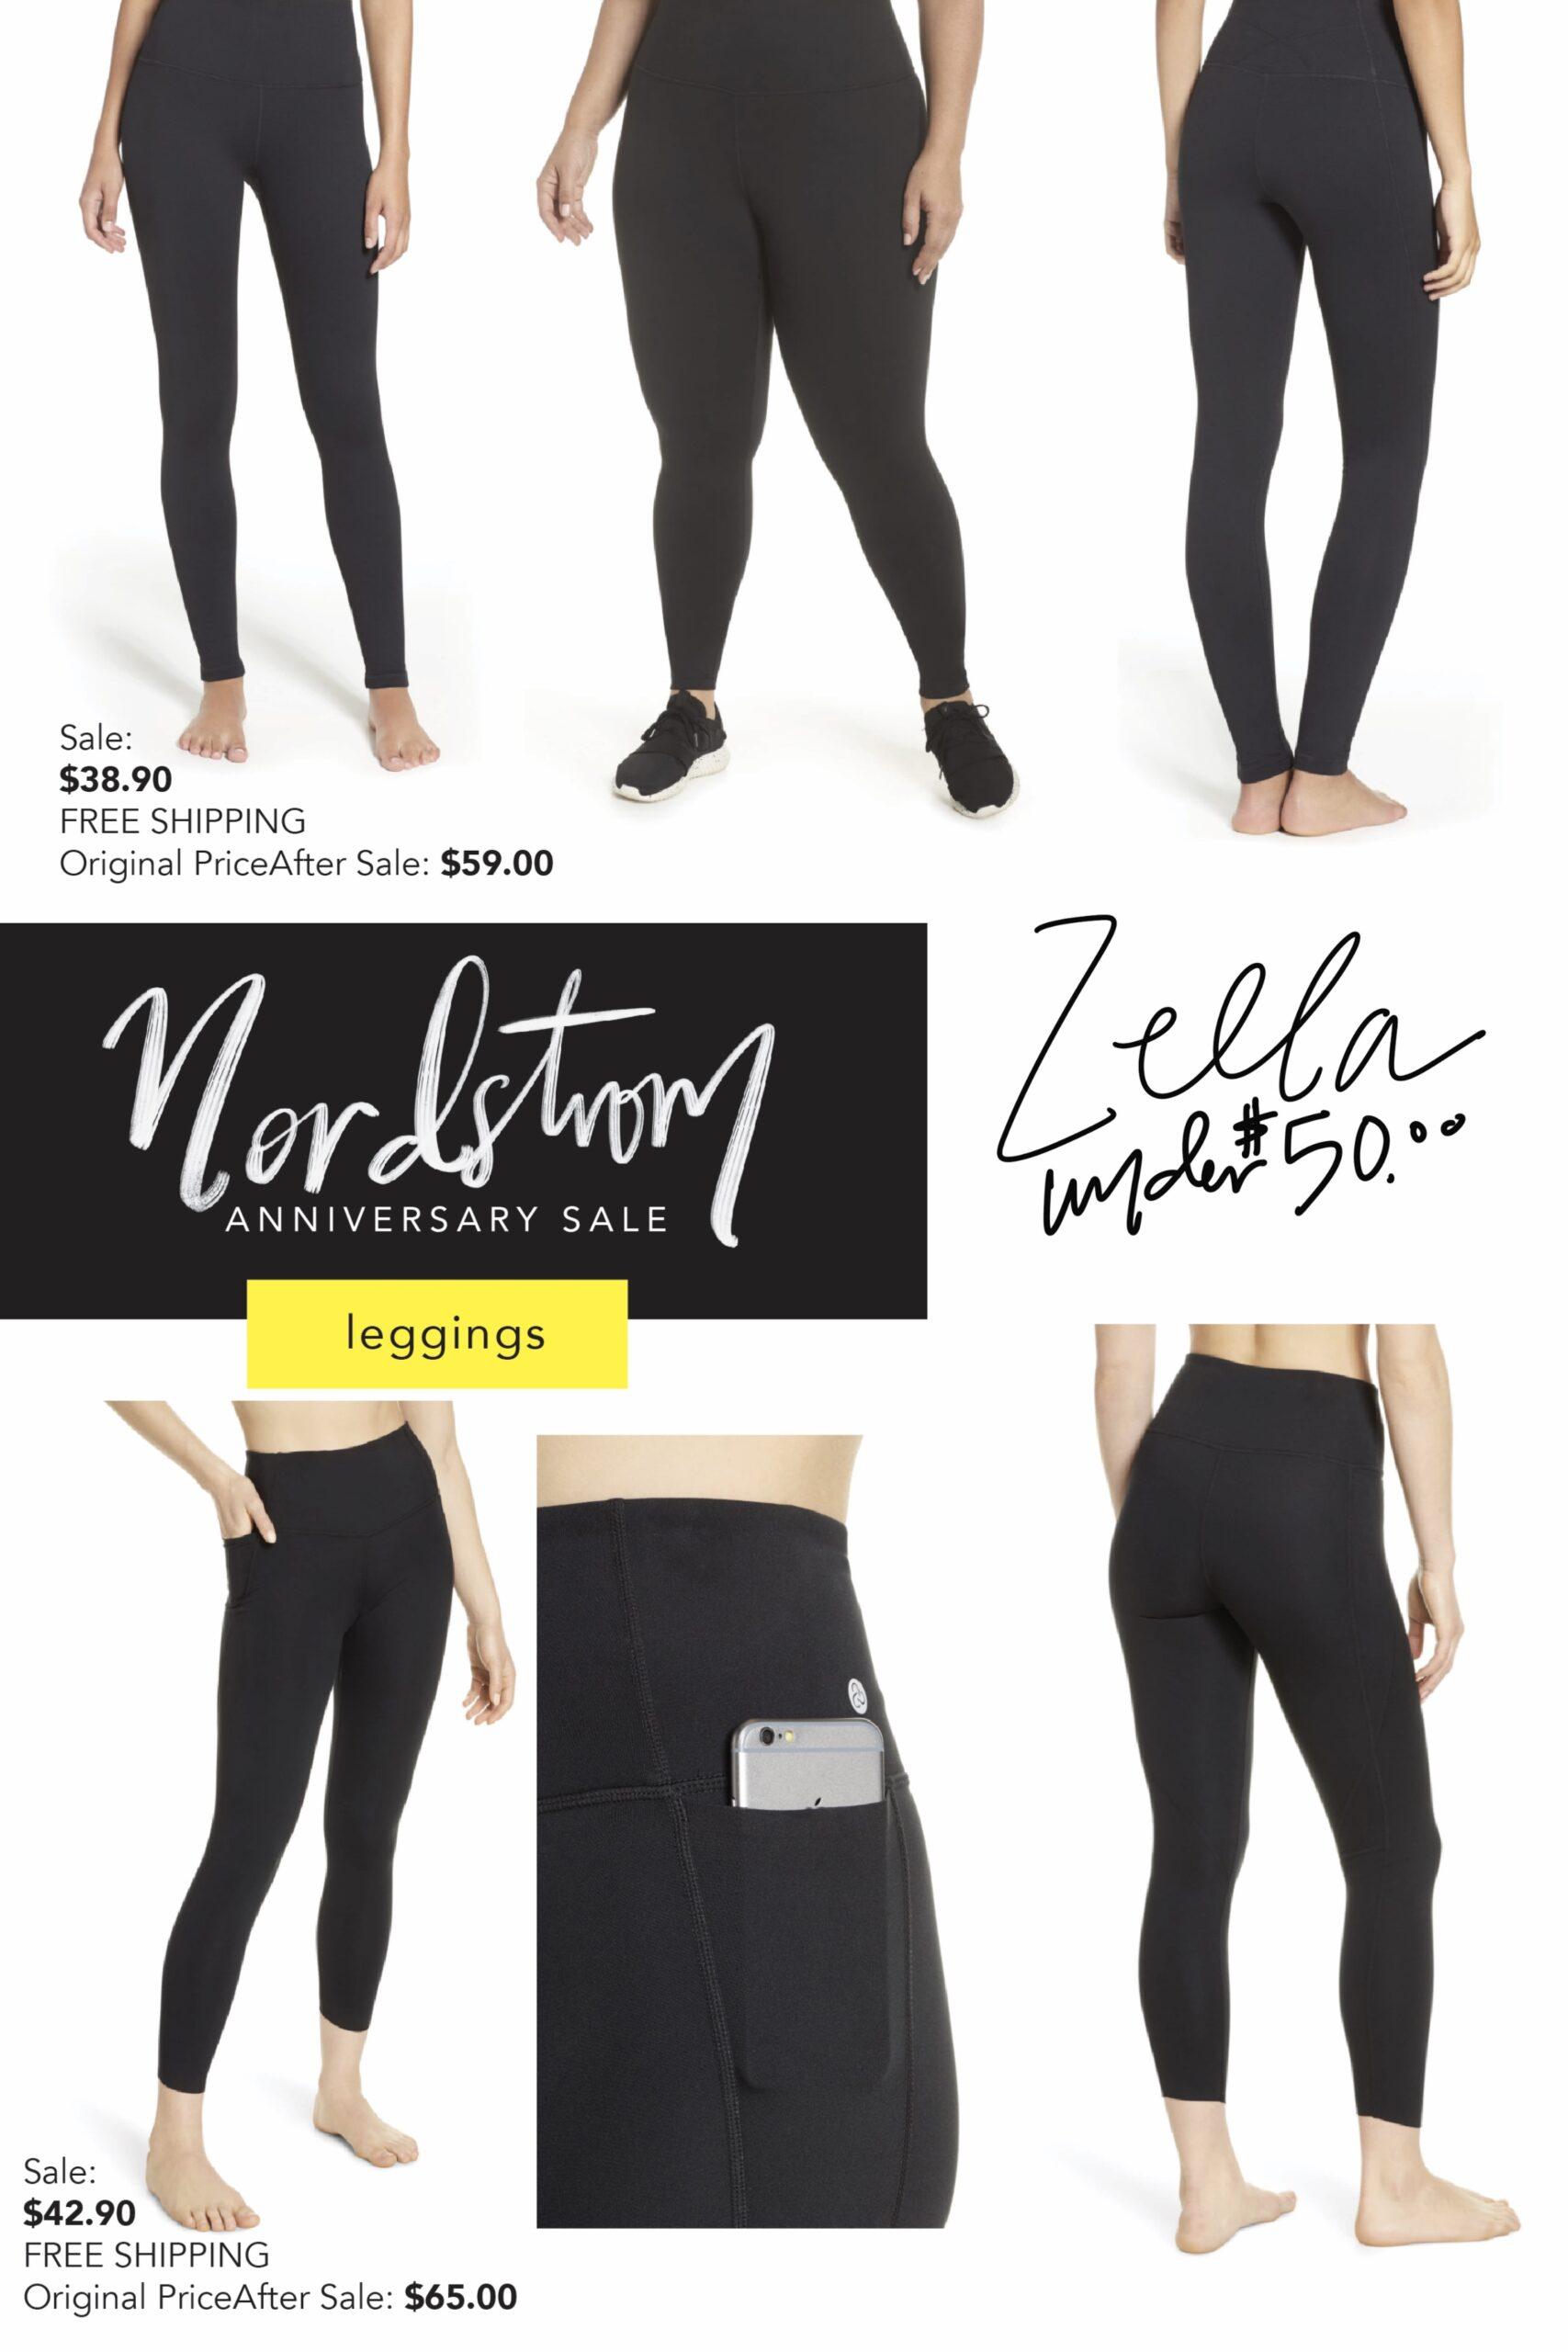 nordstrom anniversary sale- leggings